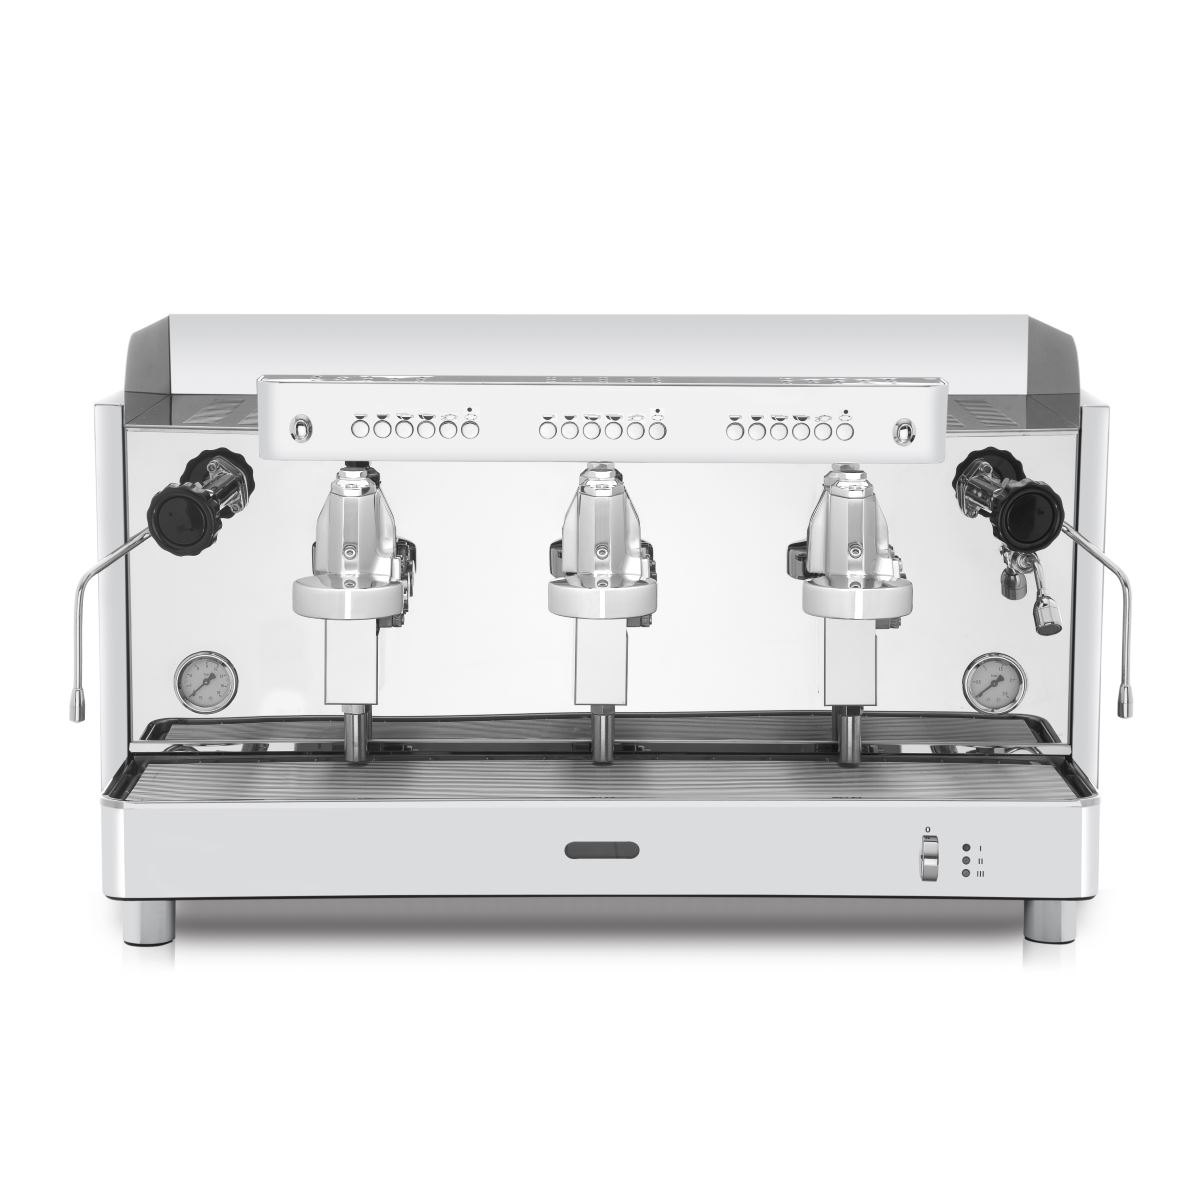 Espressor profesional Vibiemme Replica 2B Elettronica, 3 grupuri